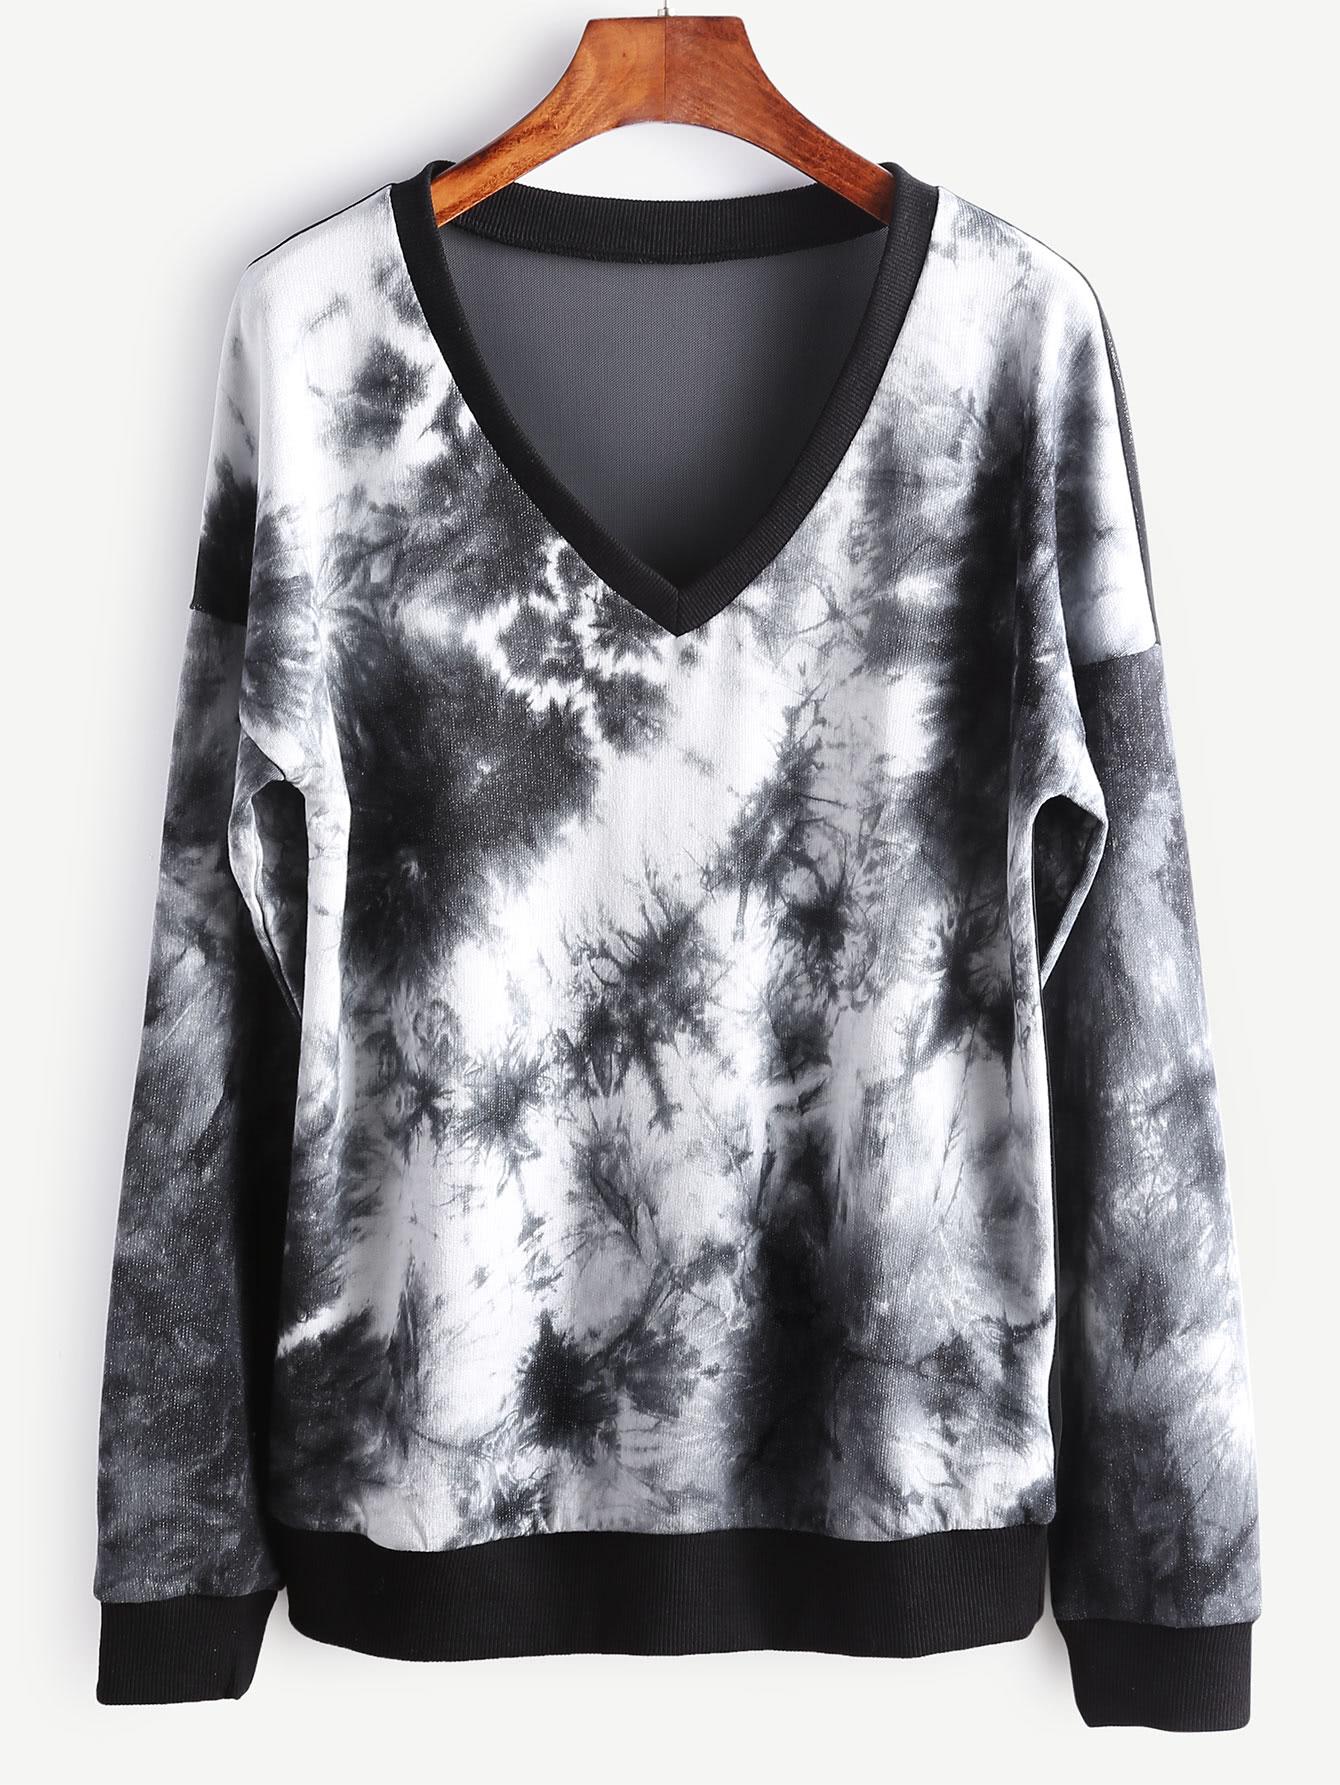 Фото Tie Dye Print Sheer Mesh Back Dropped Shoulders Sweatshirt. Купить с доставкой